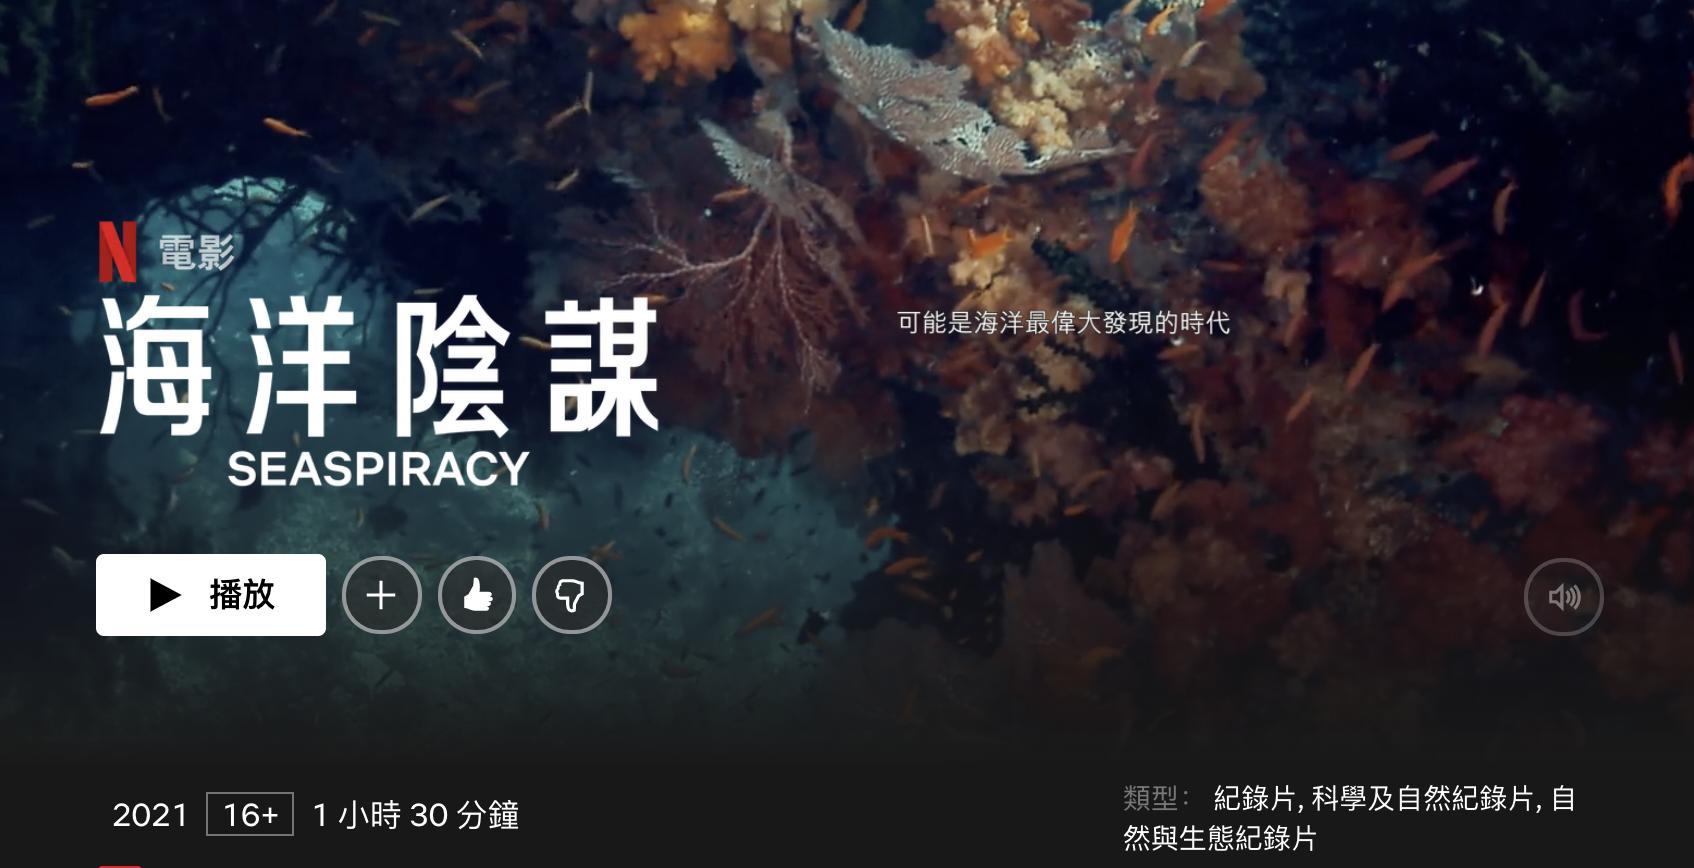 Netflix紀錄片-海洋陰謀SeaPiracy 內容跟你想得一定不一樣